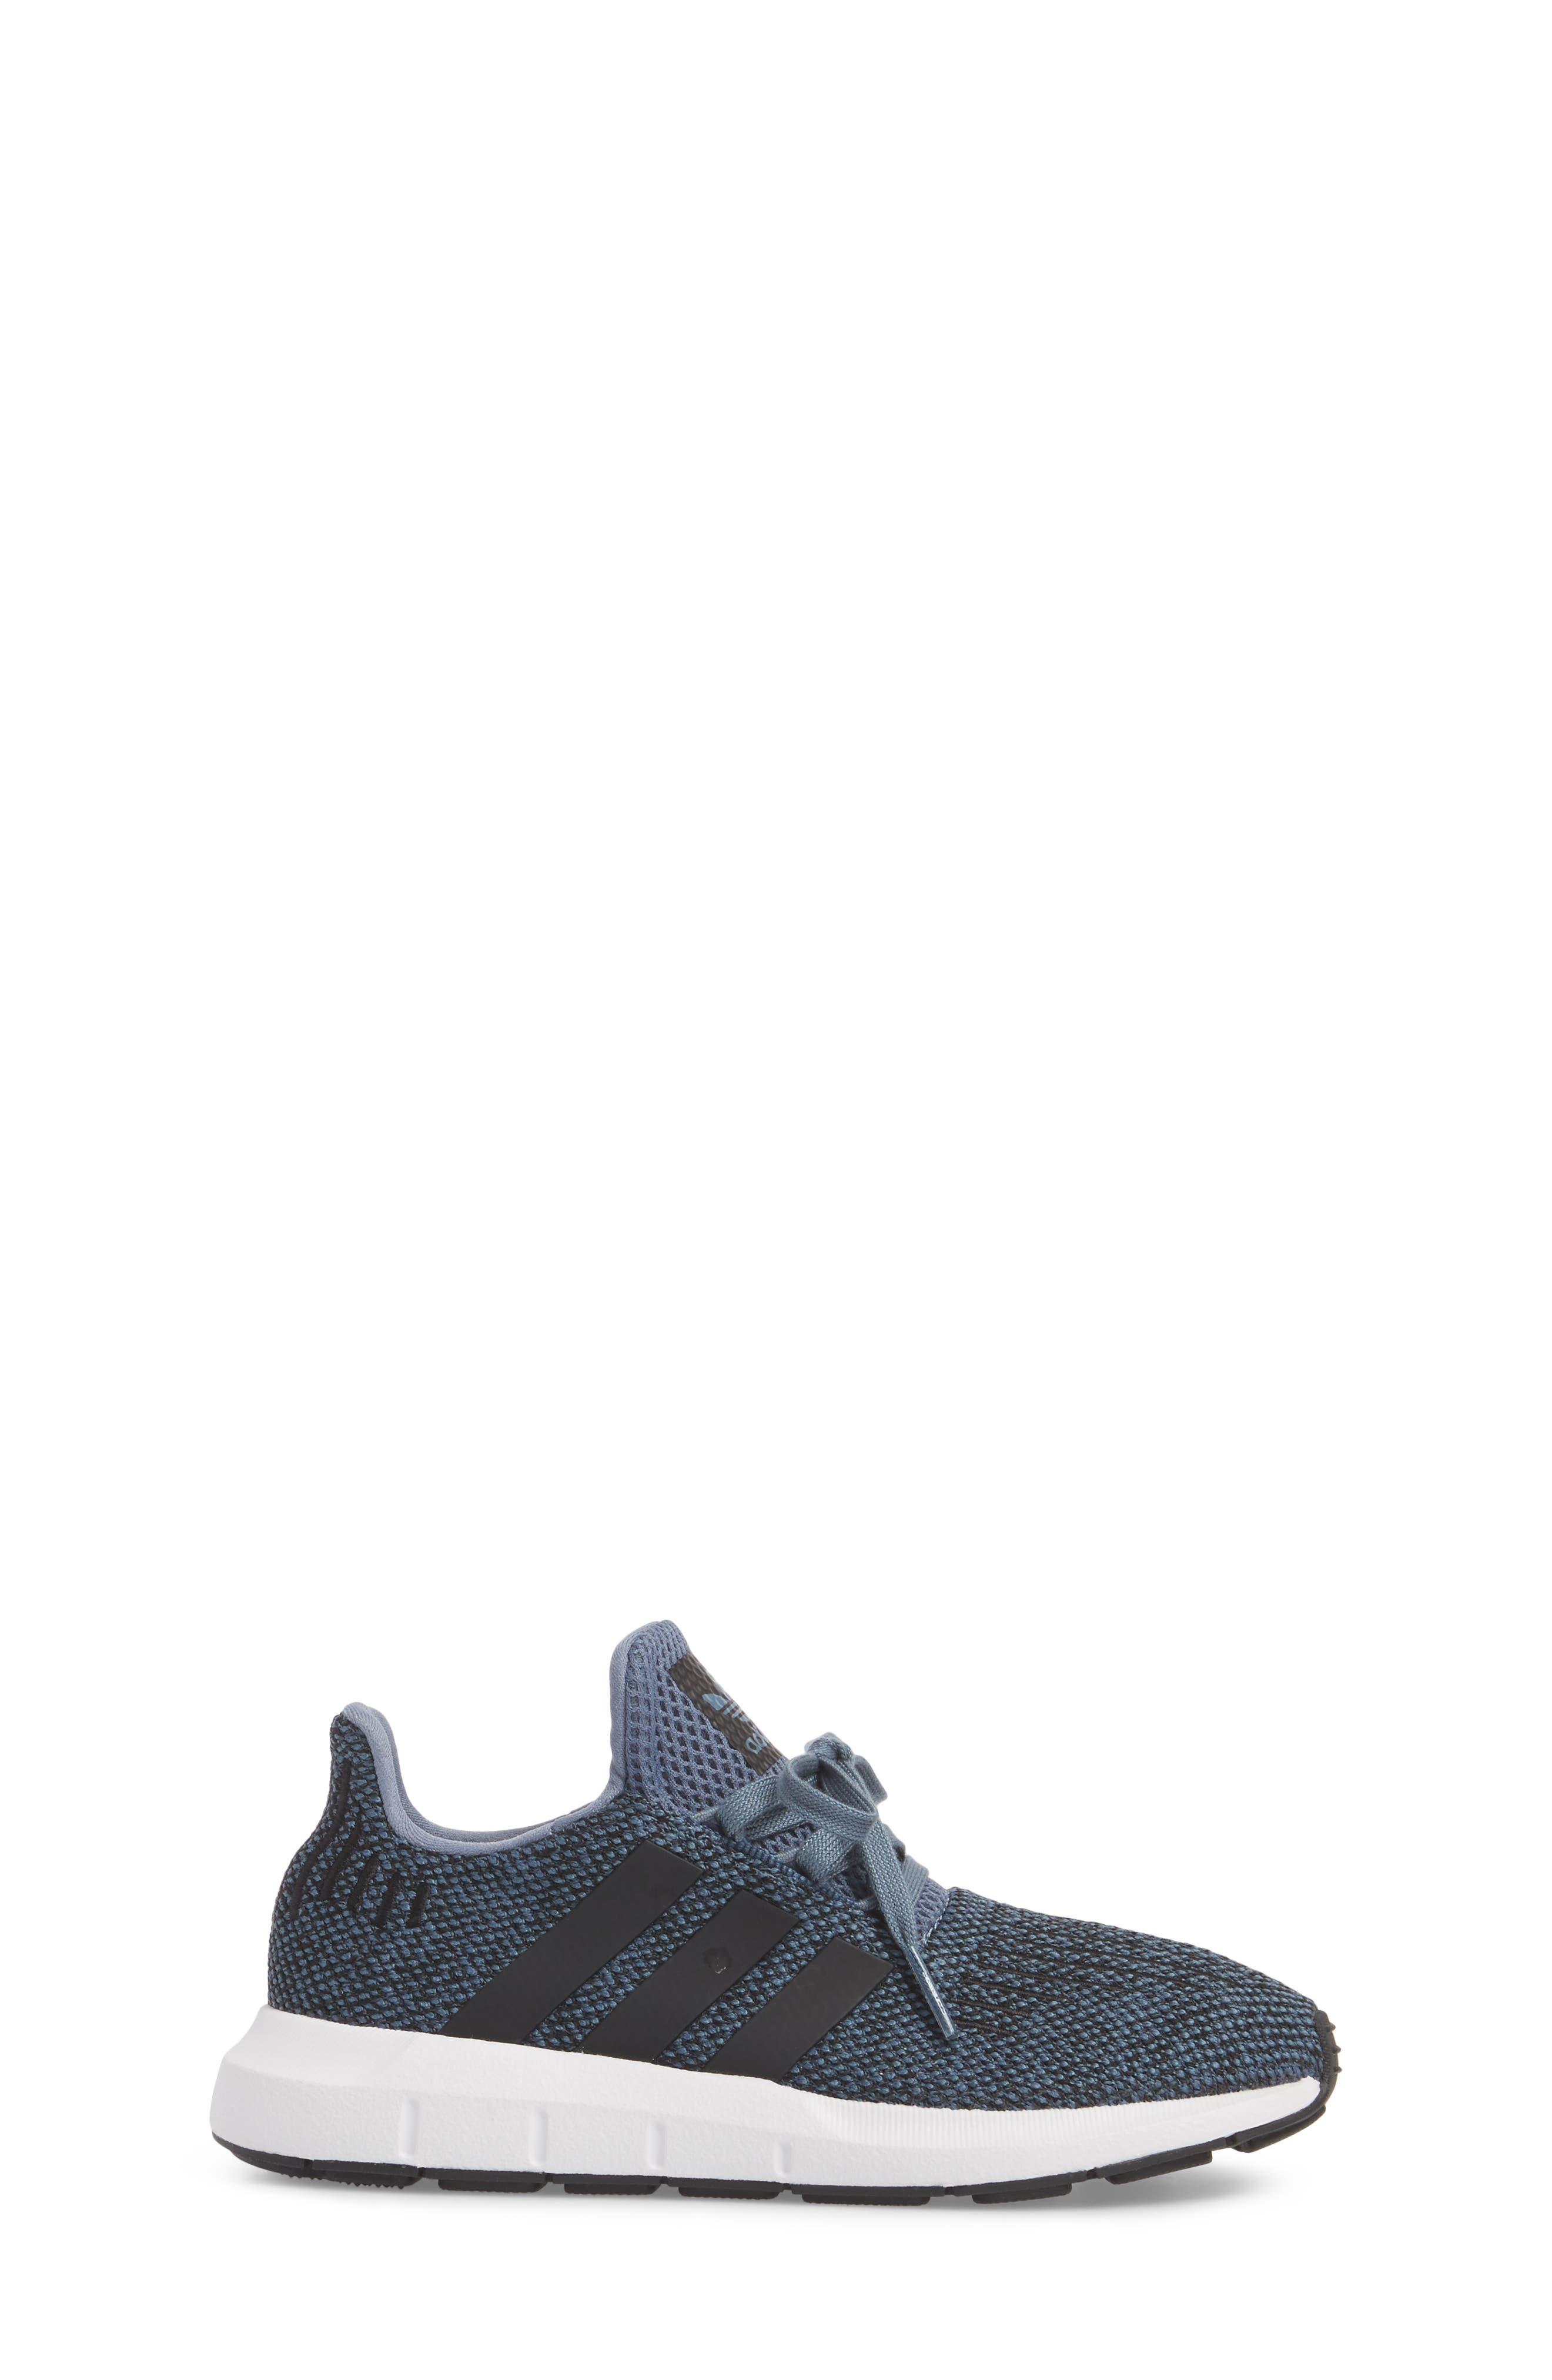 Alternate Image 3  - adidas Swift Run J Sneaker (Baby, Walker, Toddler, Little Kid & Big Kid)